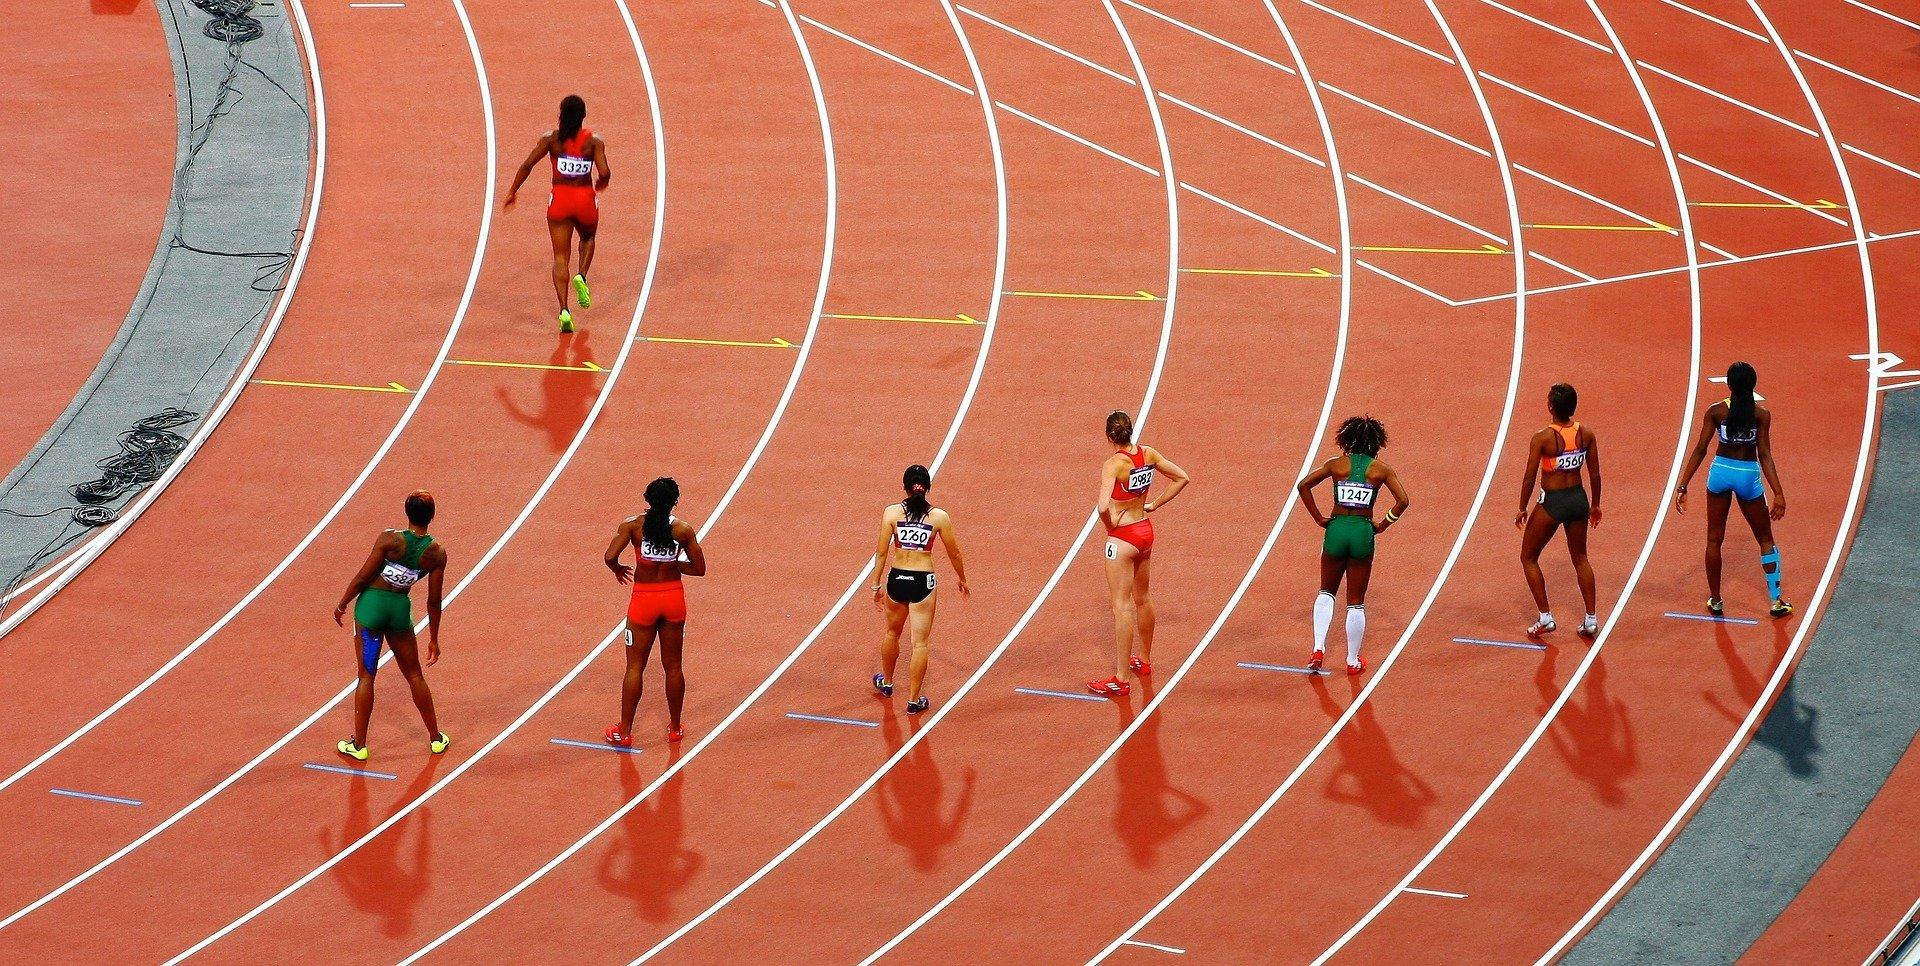 racetrack, runners, olympics